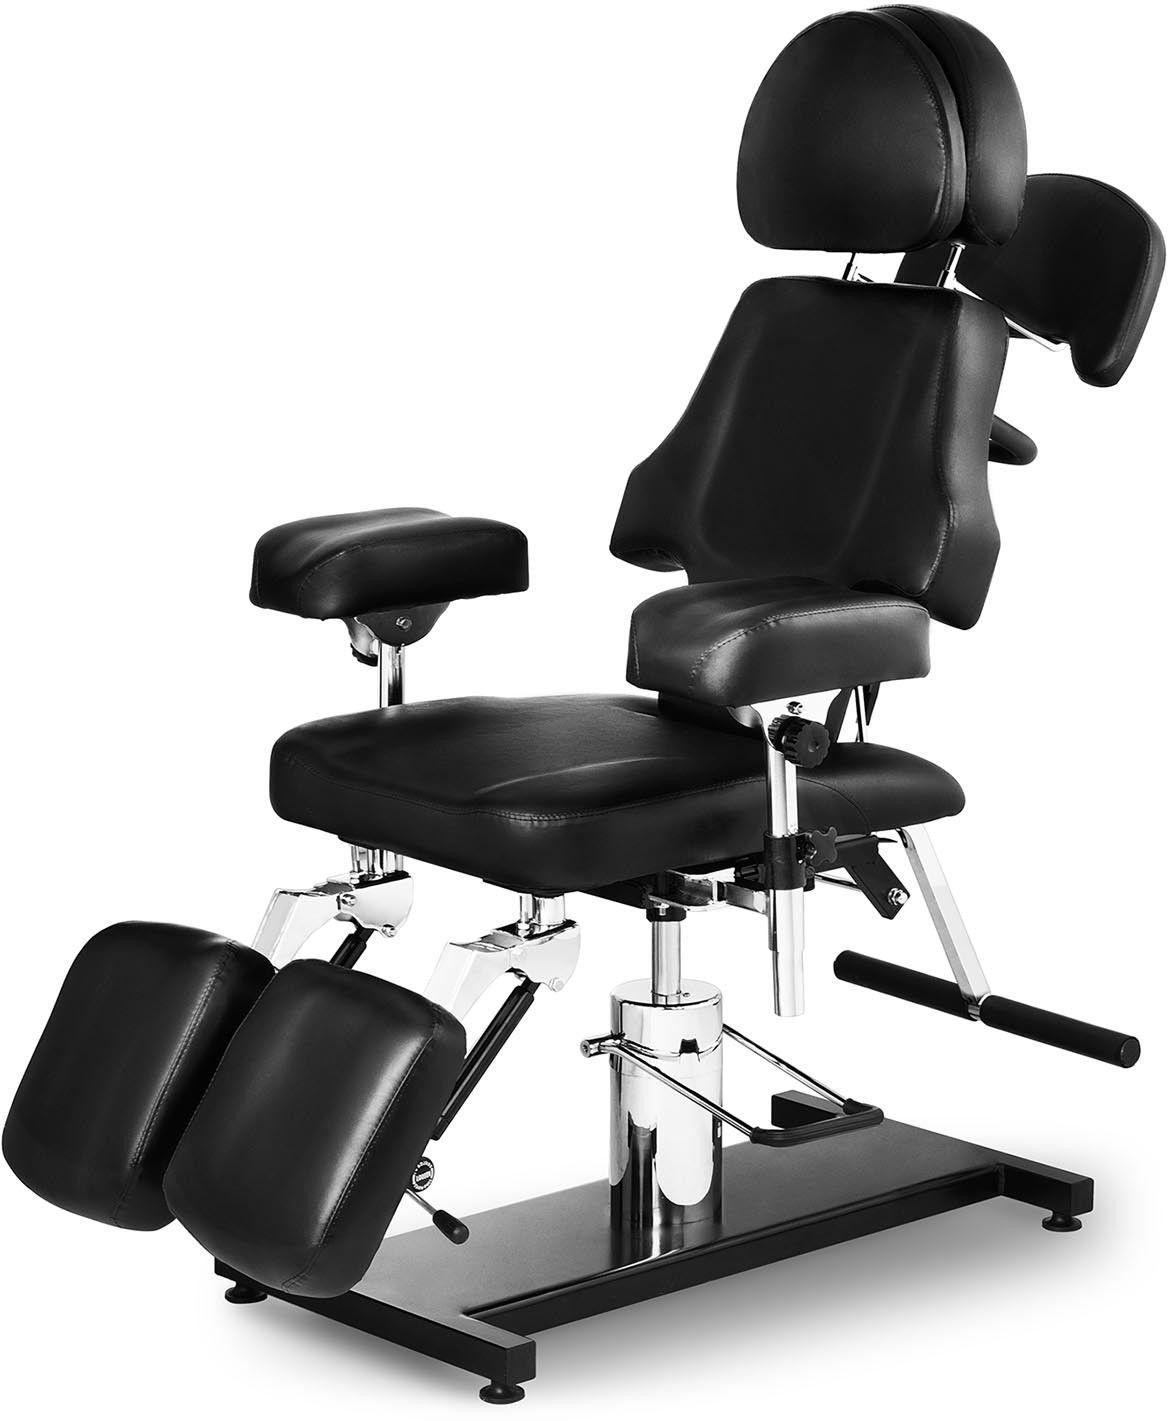 Fotel do tatuażu Dallas - czarny - physa - PHYSA DALLAS BLACK - 3 lata gwarancji/wysyłka w 24h